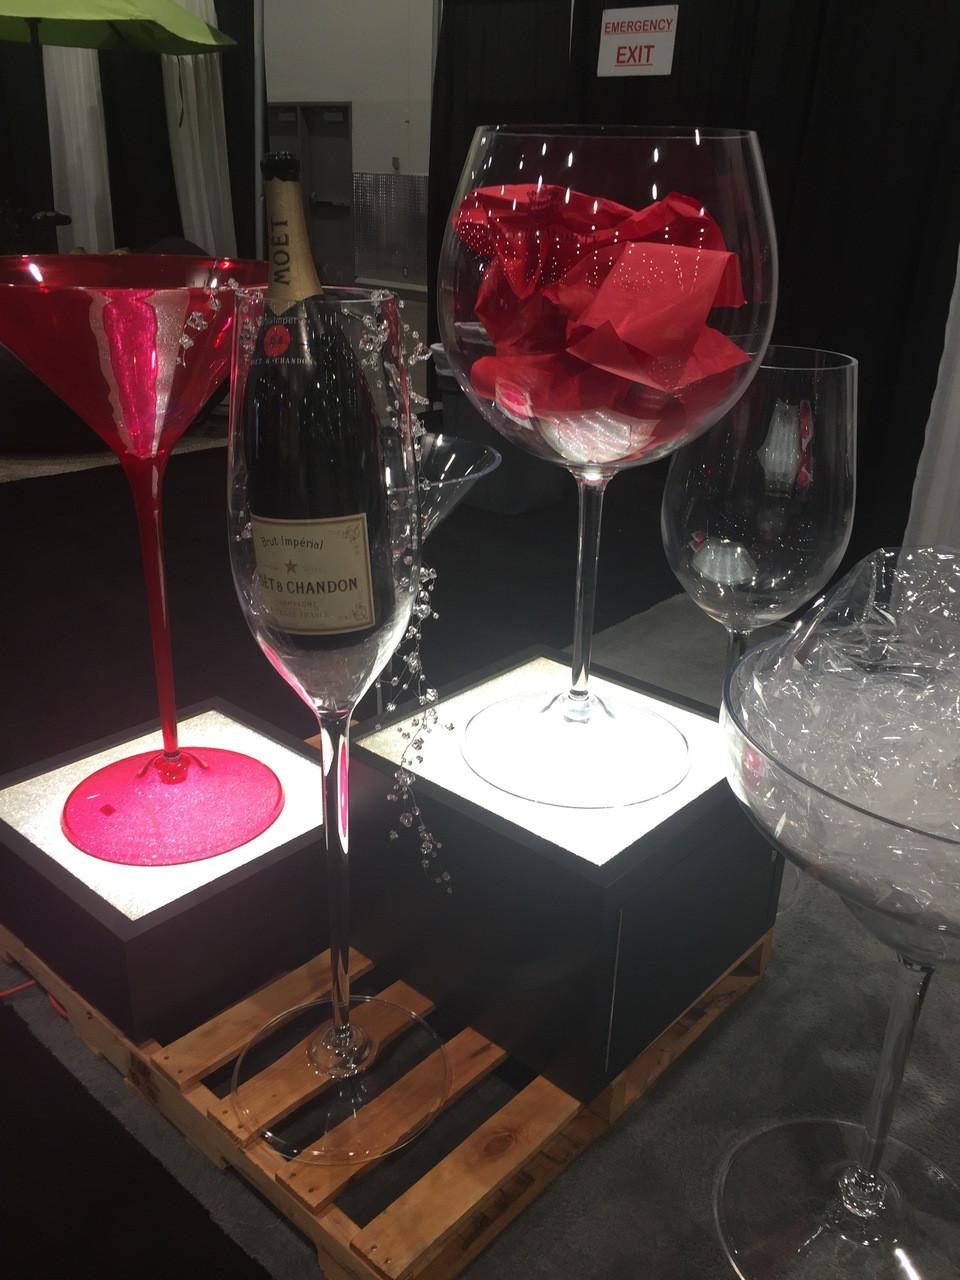 JUMBO HUGE DRINK CUPS - MARTINI CUP, MARGARITA BOWL, WINE GLASS or CHAMPAGNE FLUTE (3 Huge Sizes) Jumbo - Giant - Large